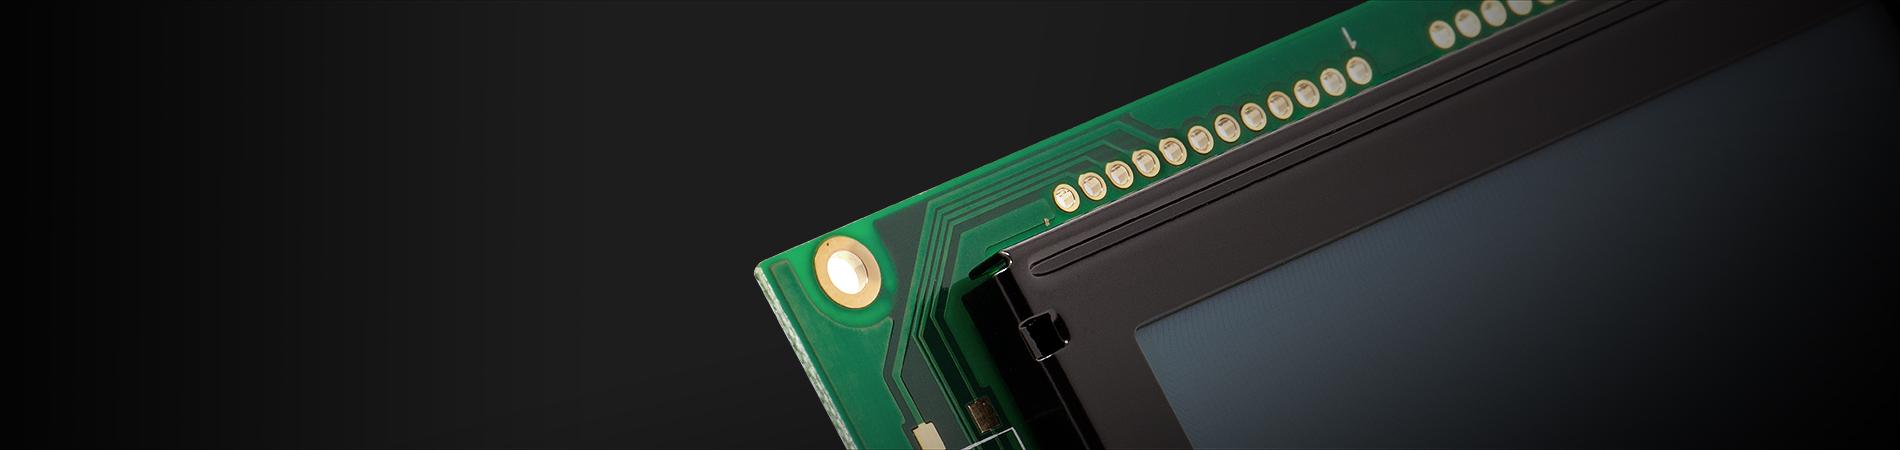 Oled LCD custom alfanumerico grafico touch screen